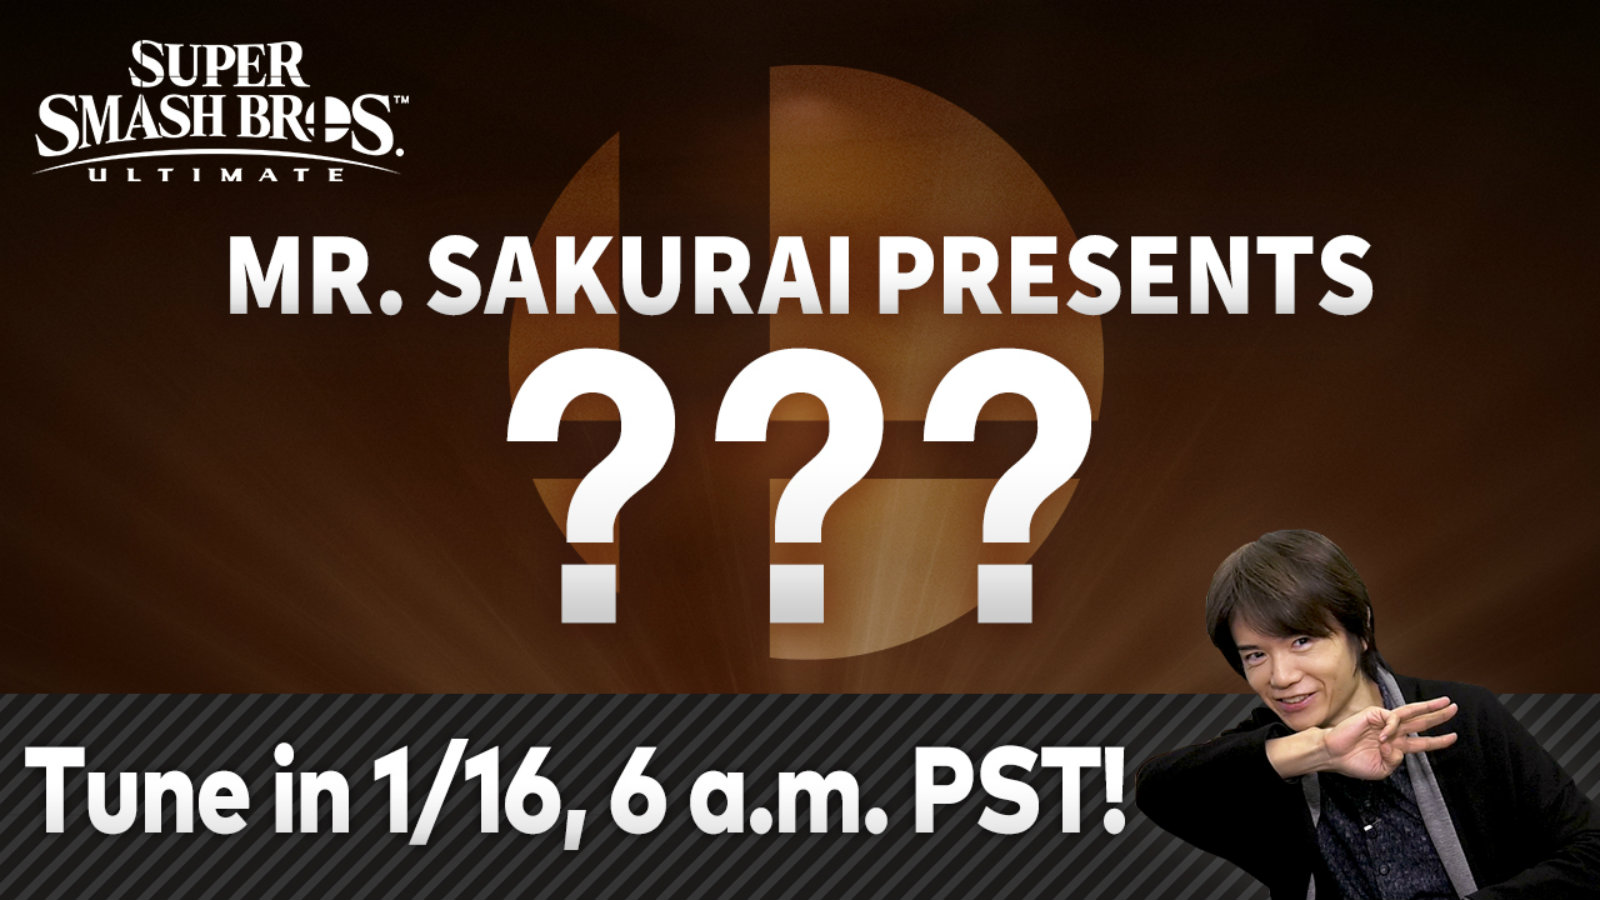 Sakuari presents Super Smash Bros Ultimate DLC fighter five